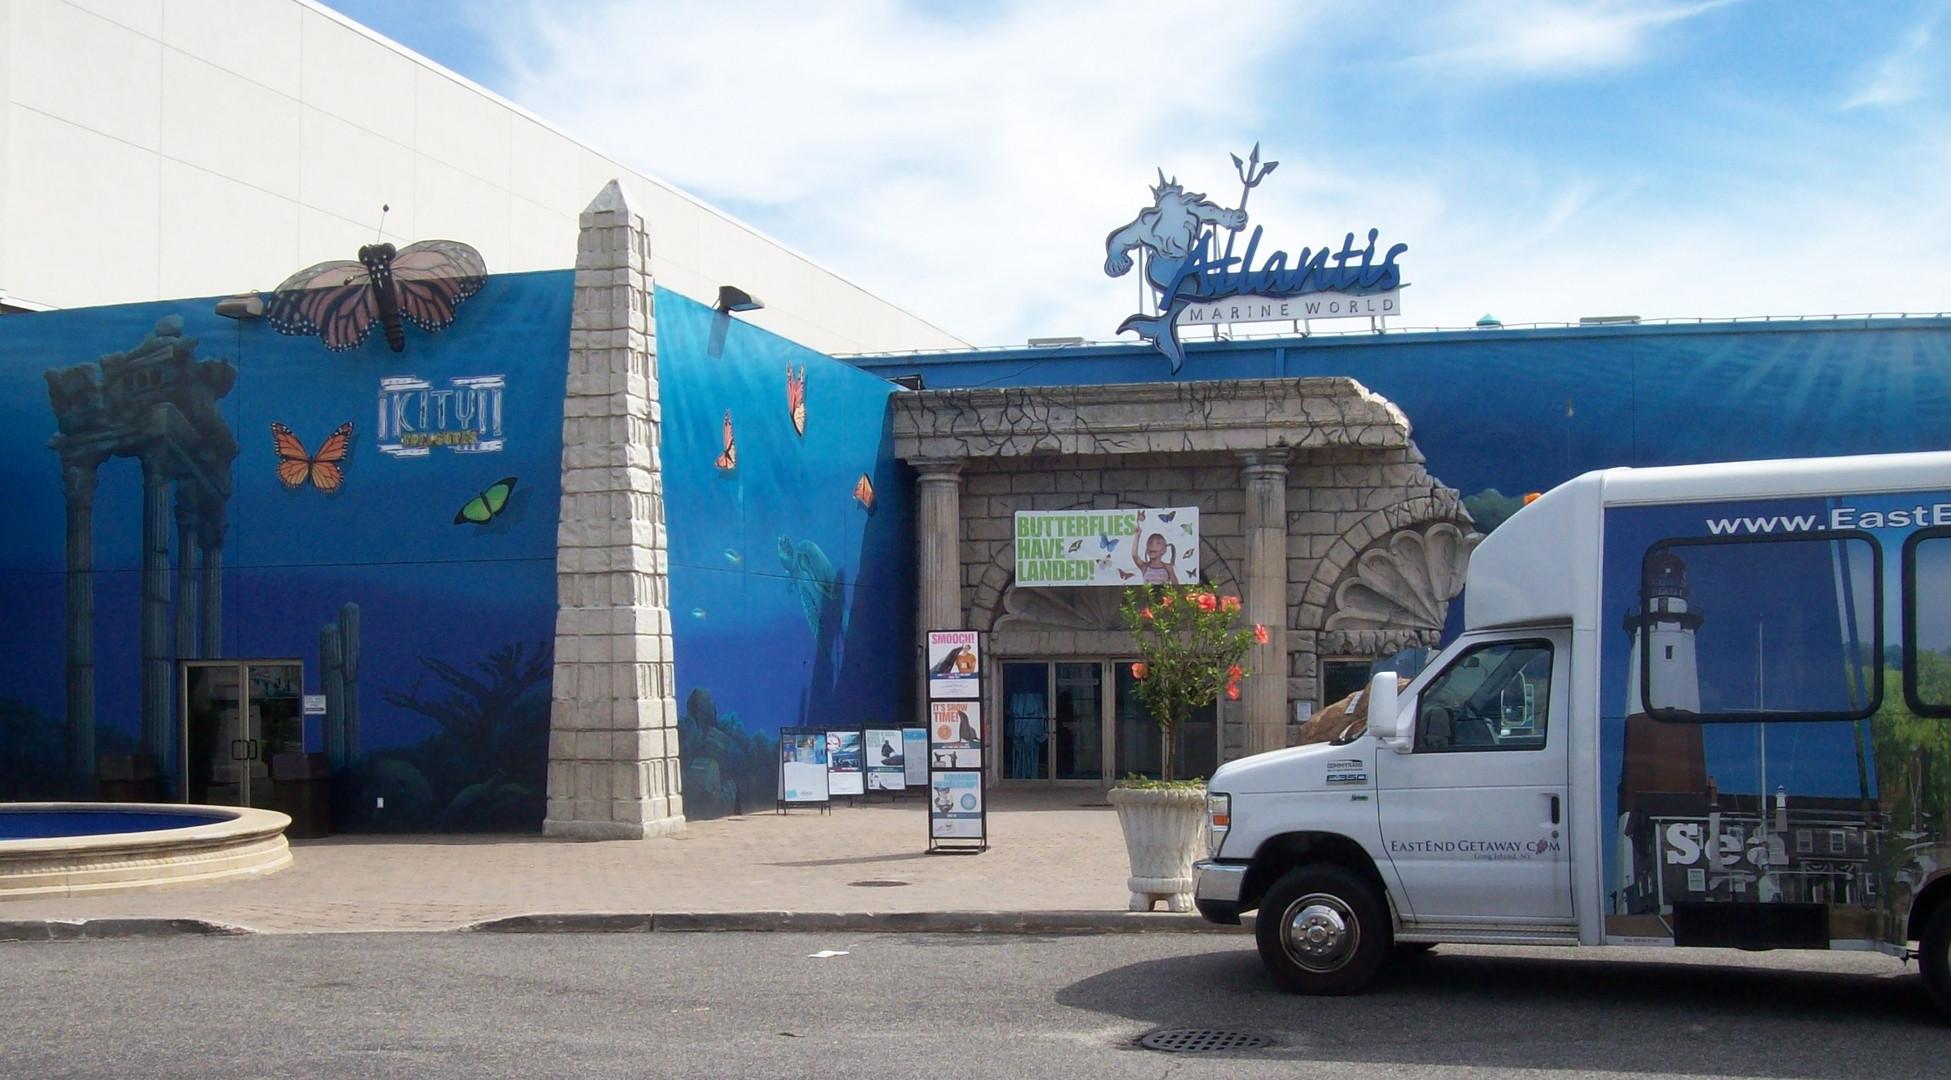 Final stop - the Atlantis Long Island Aquarium